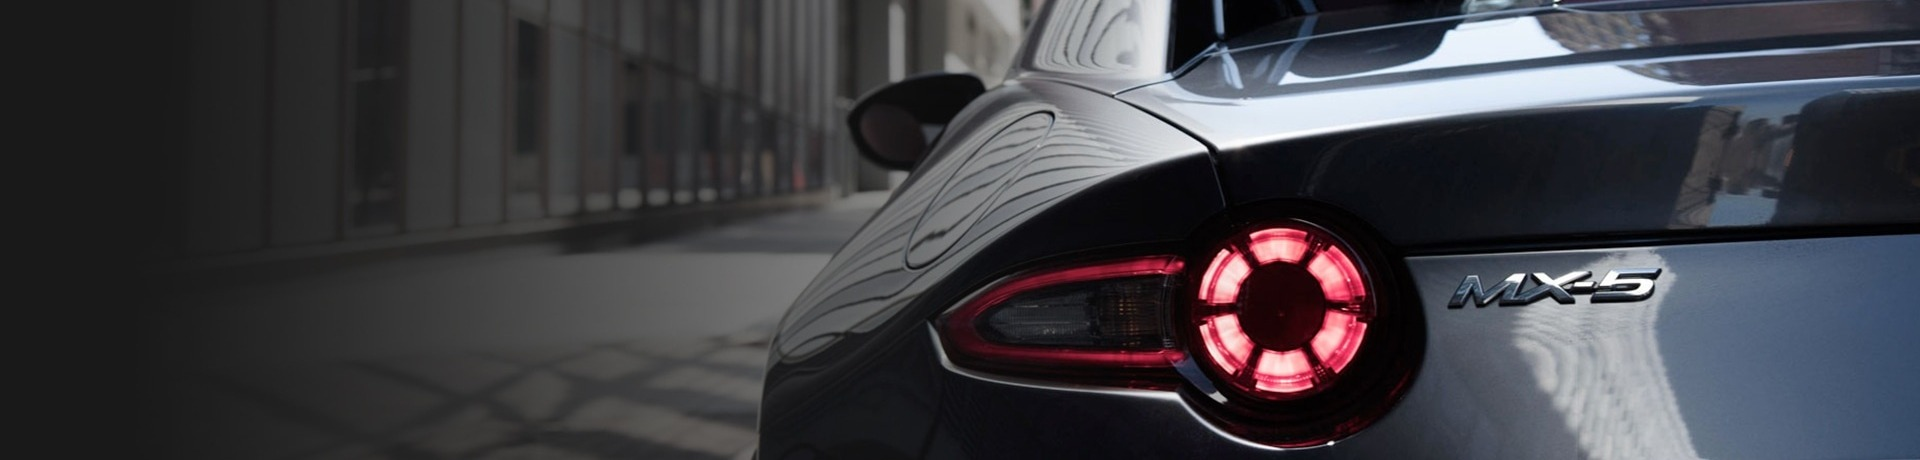 Mazda Parts Edwardstown | Australian Motors Mazda